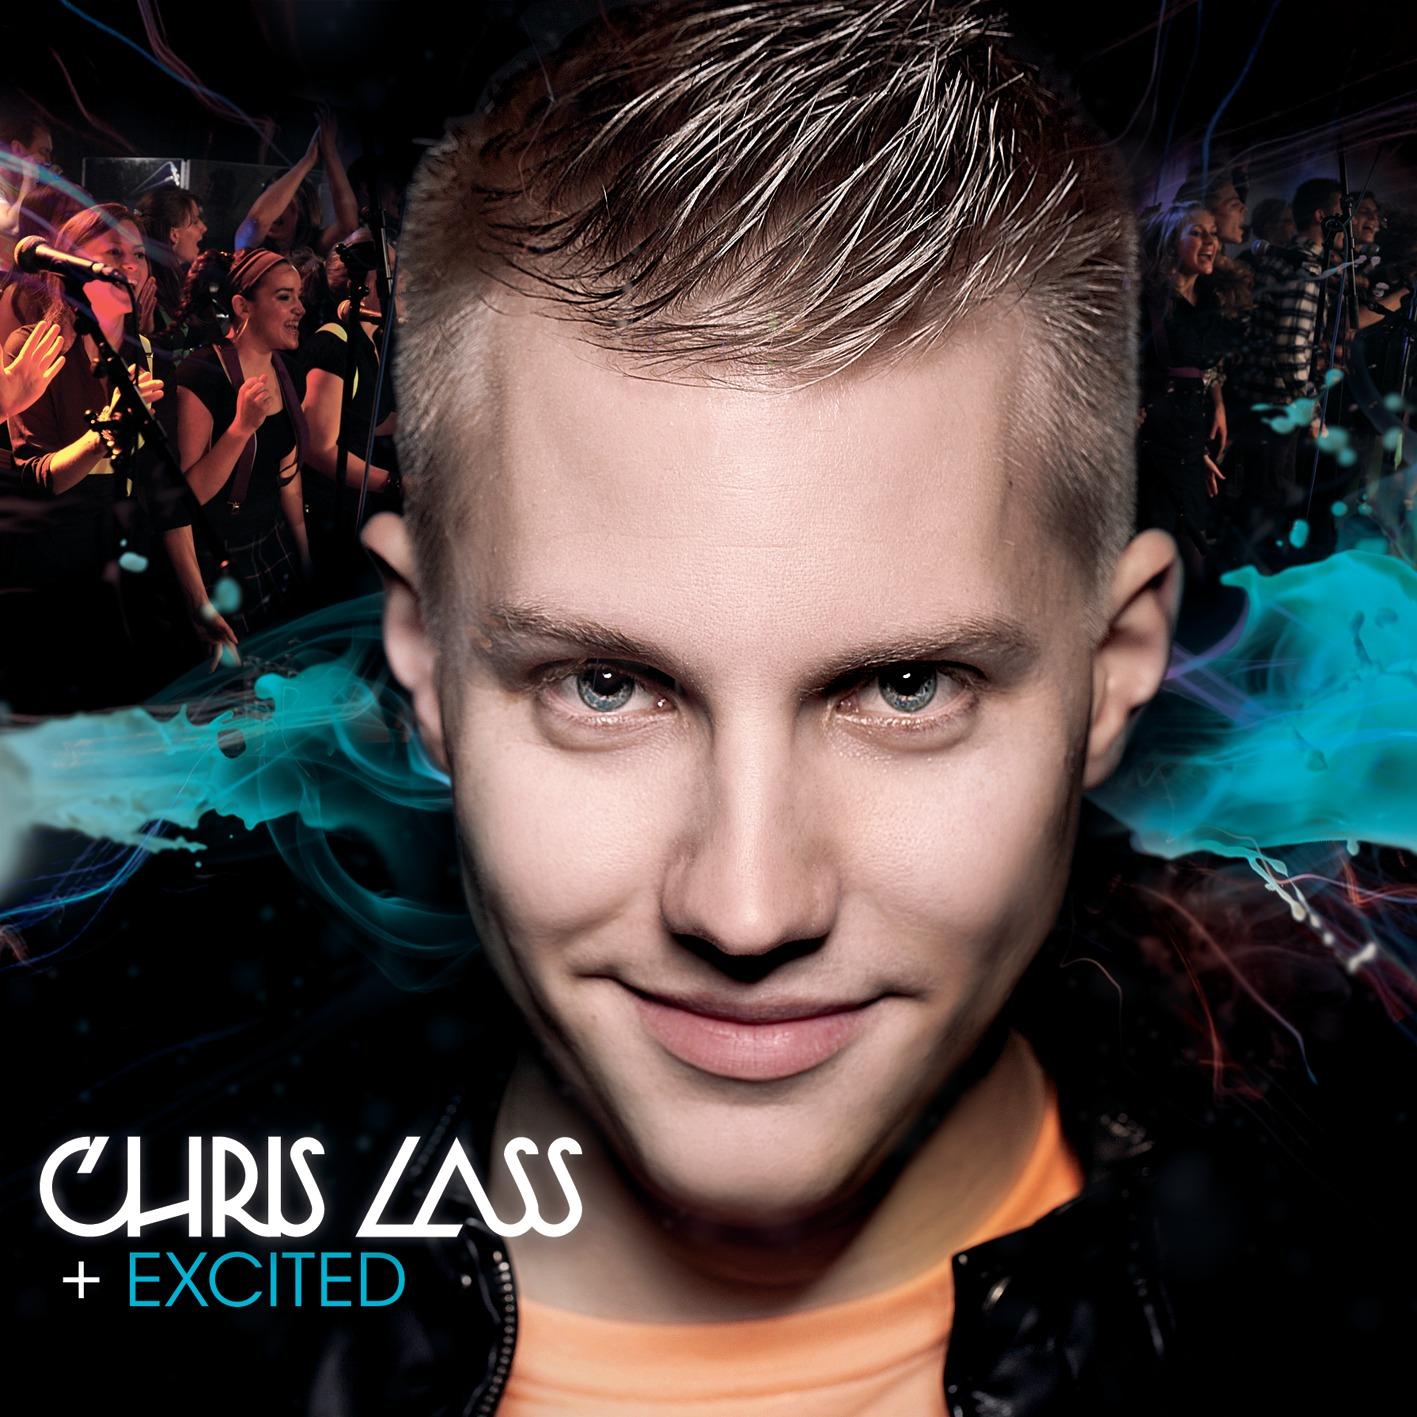 Chris Lass + Excited Chris Lass